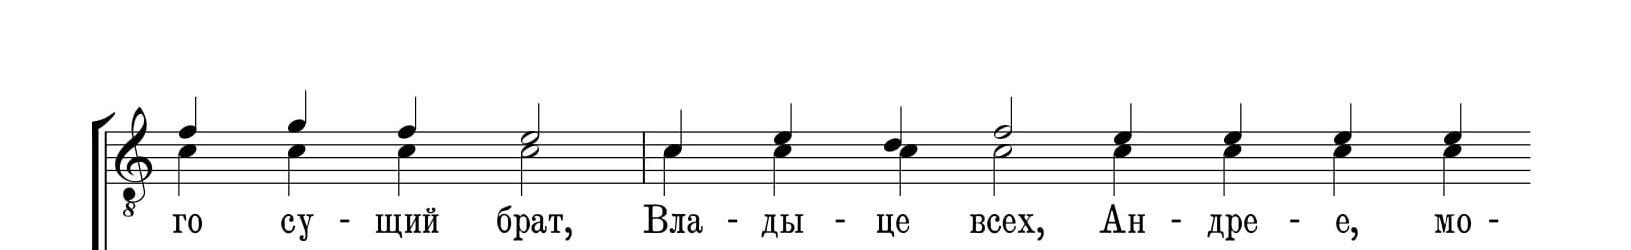 Тропарь апостолу Андрею (Афанасий)